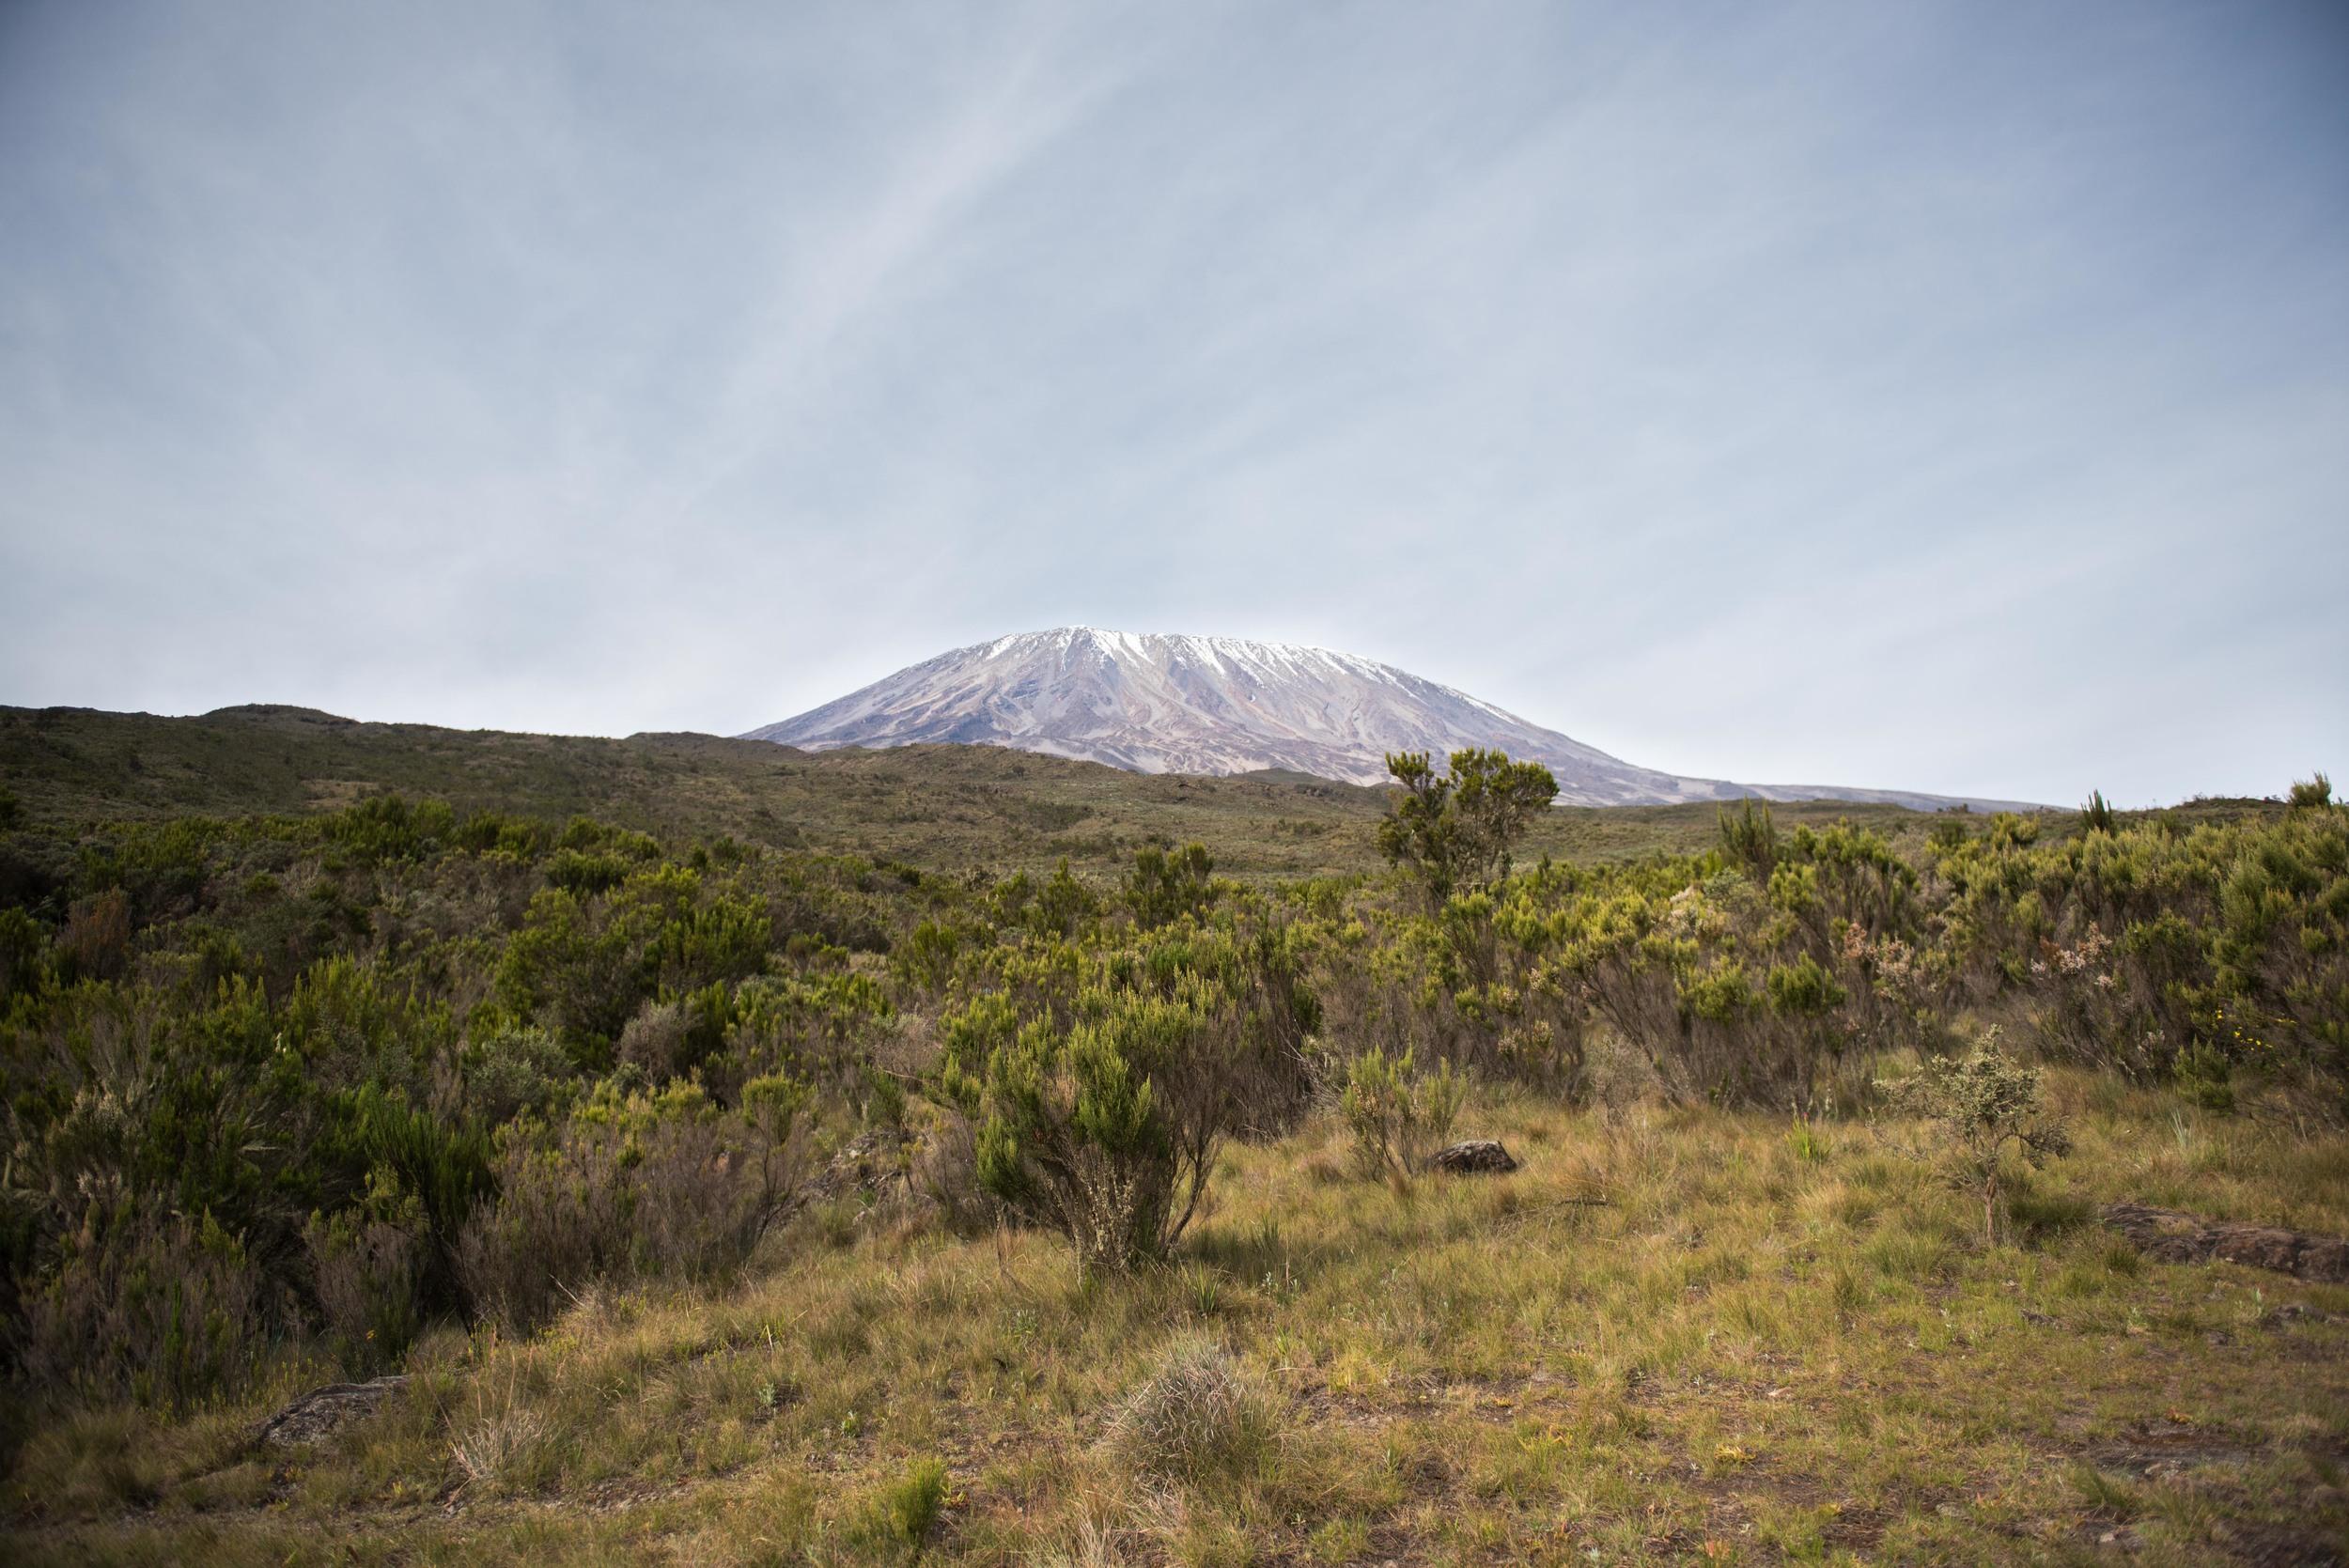 WEB_Kilimanjaro-9.jpg